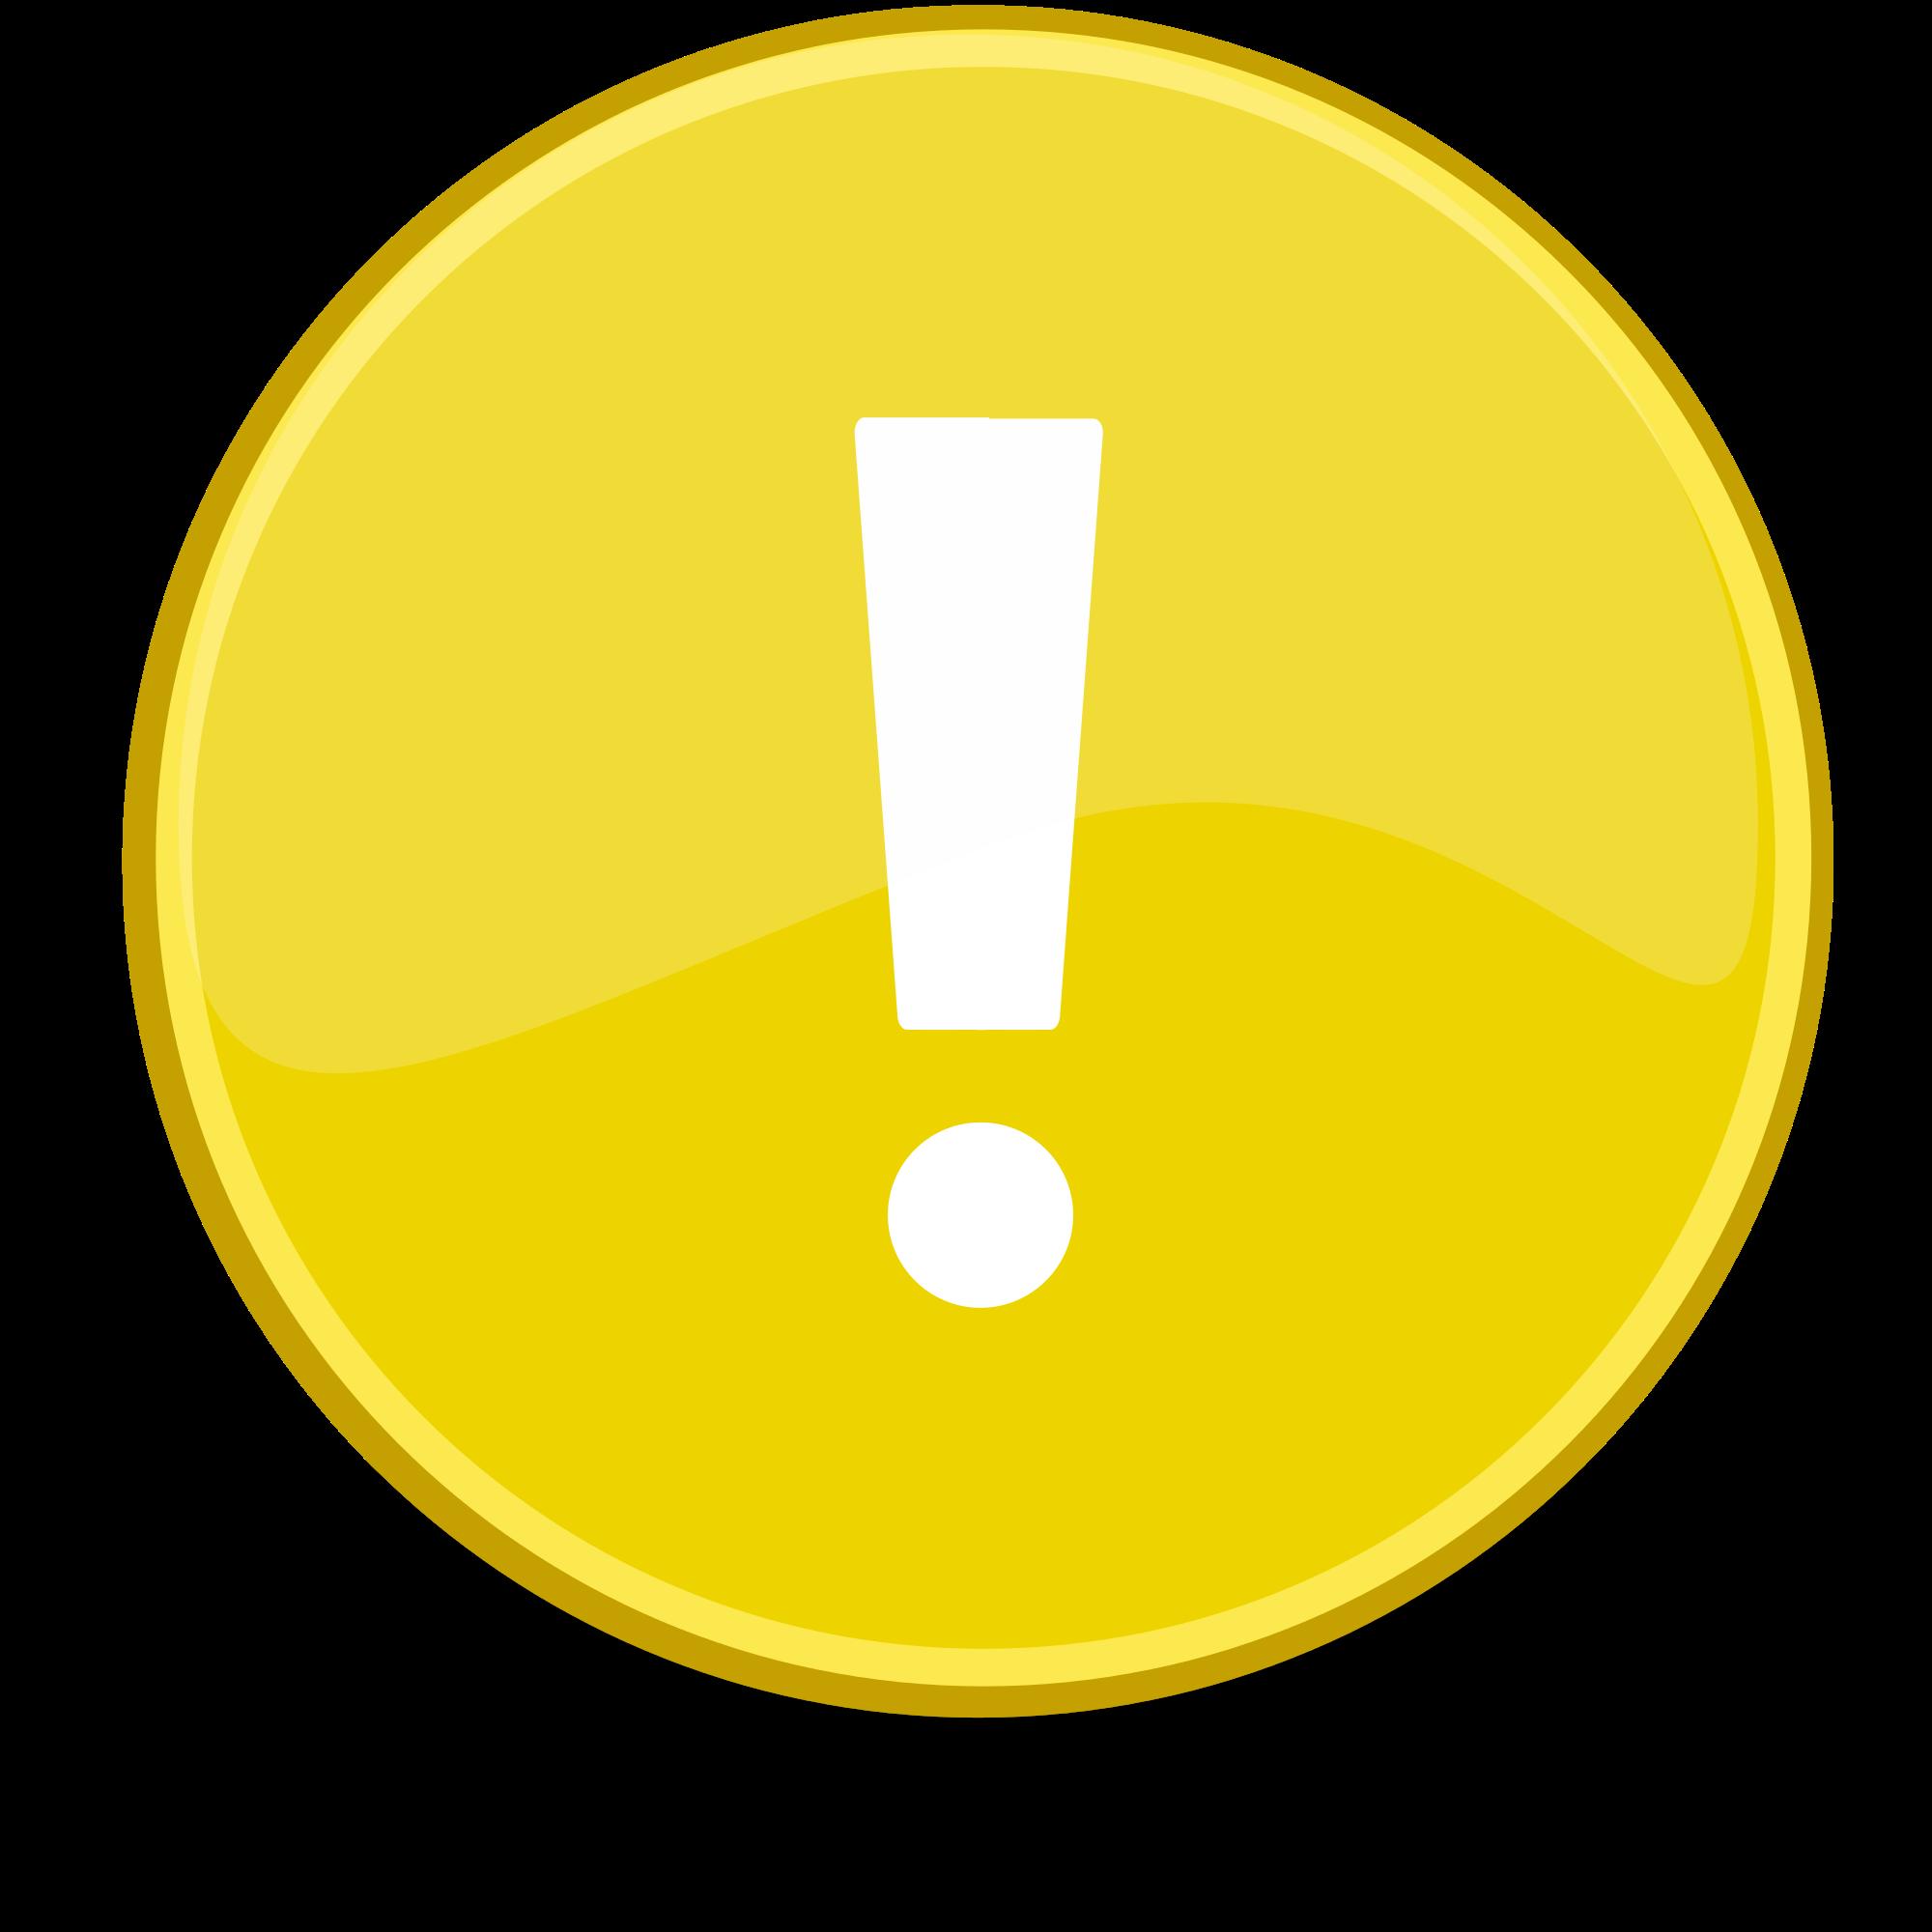 File emblem yellow svg. Important clipart important point